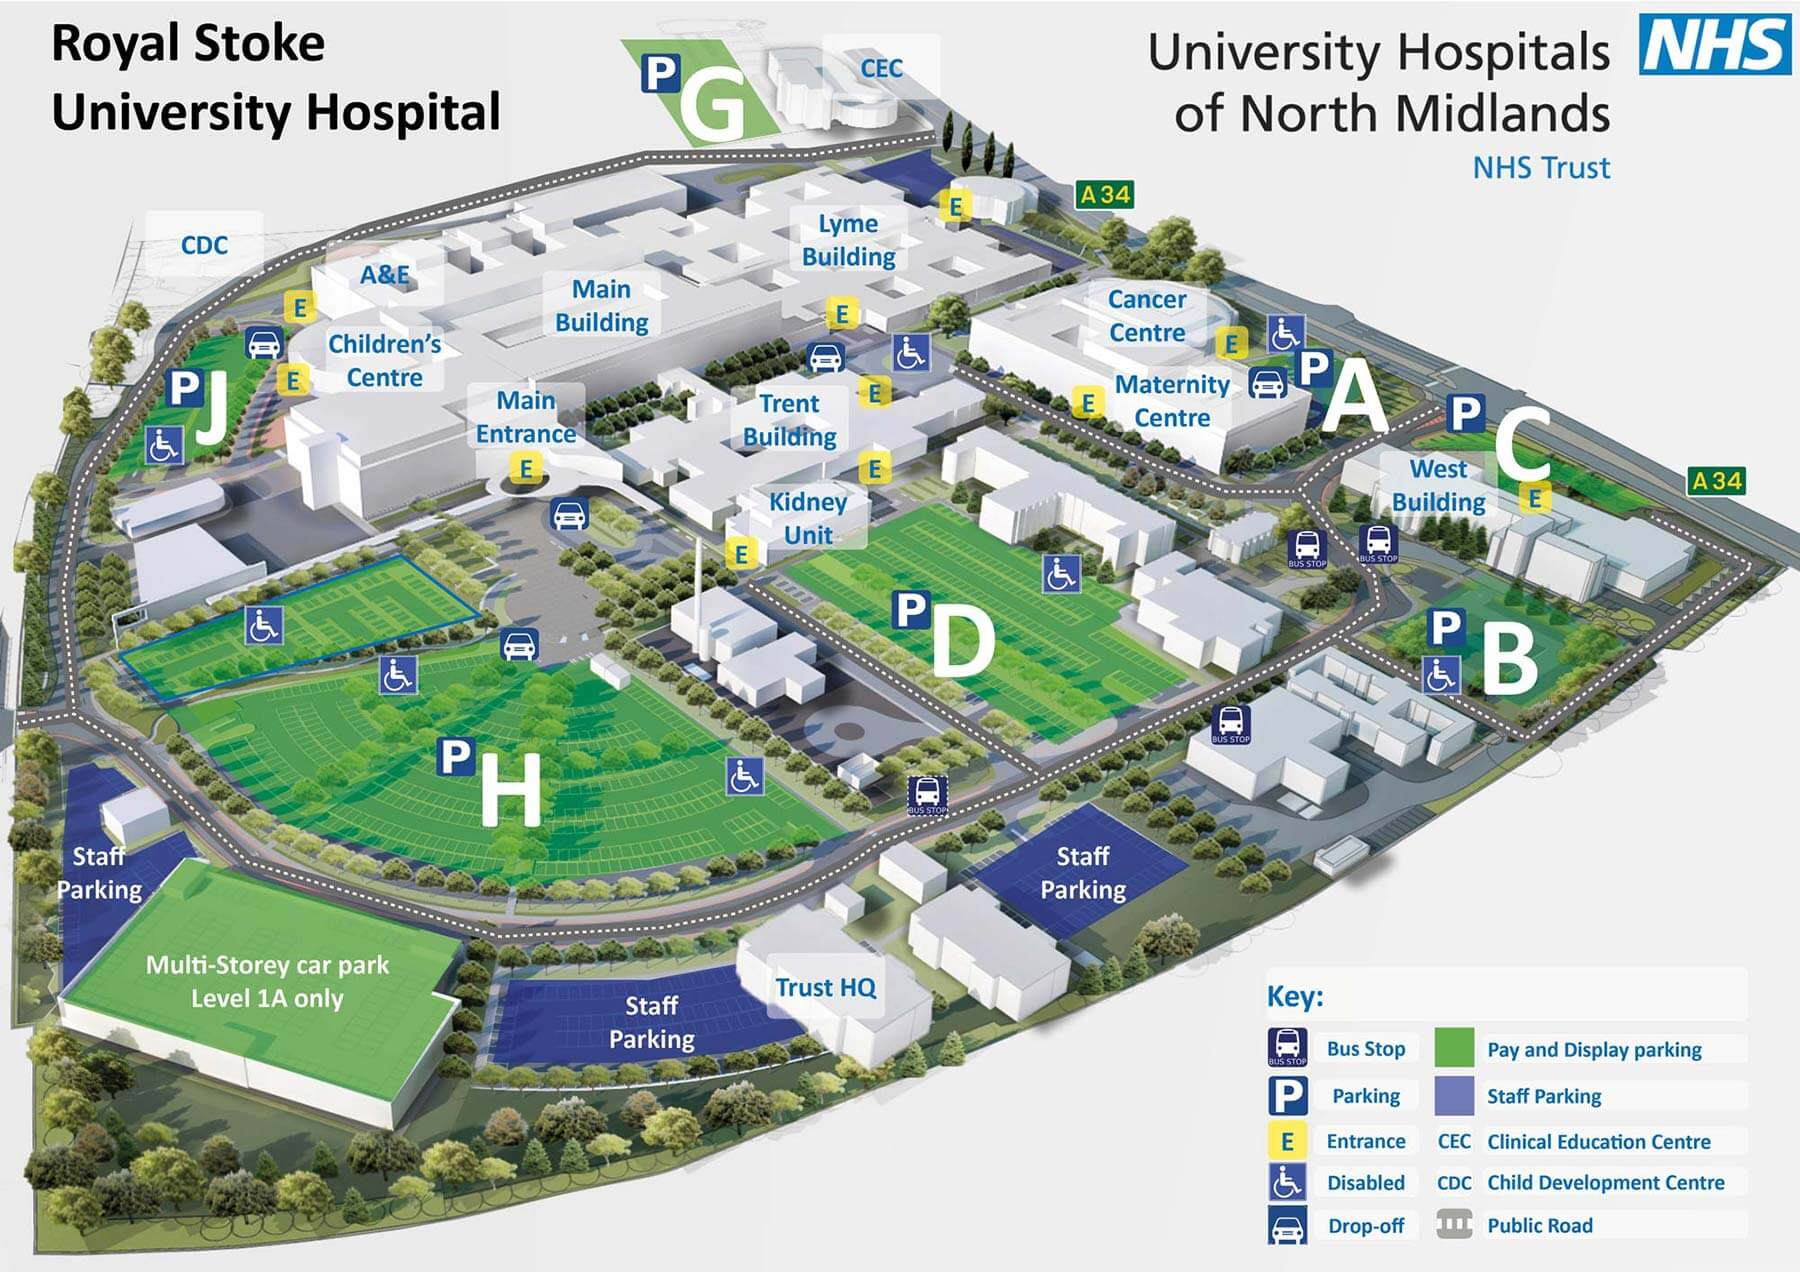 Norwich Campus Map.Norwich Campus Map Www Topsimages Com